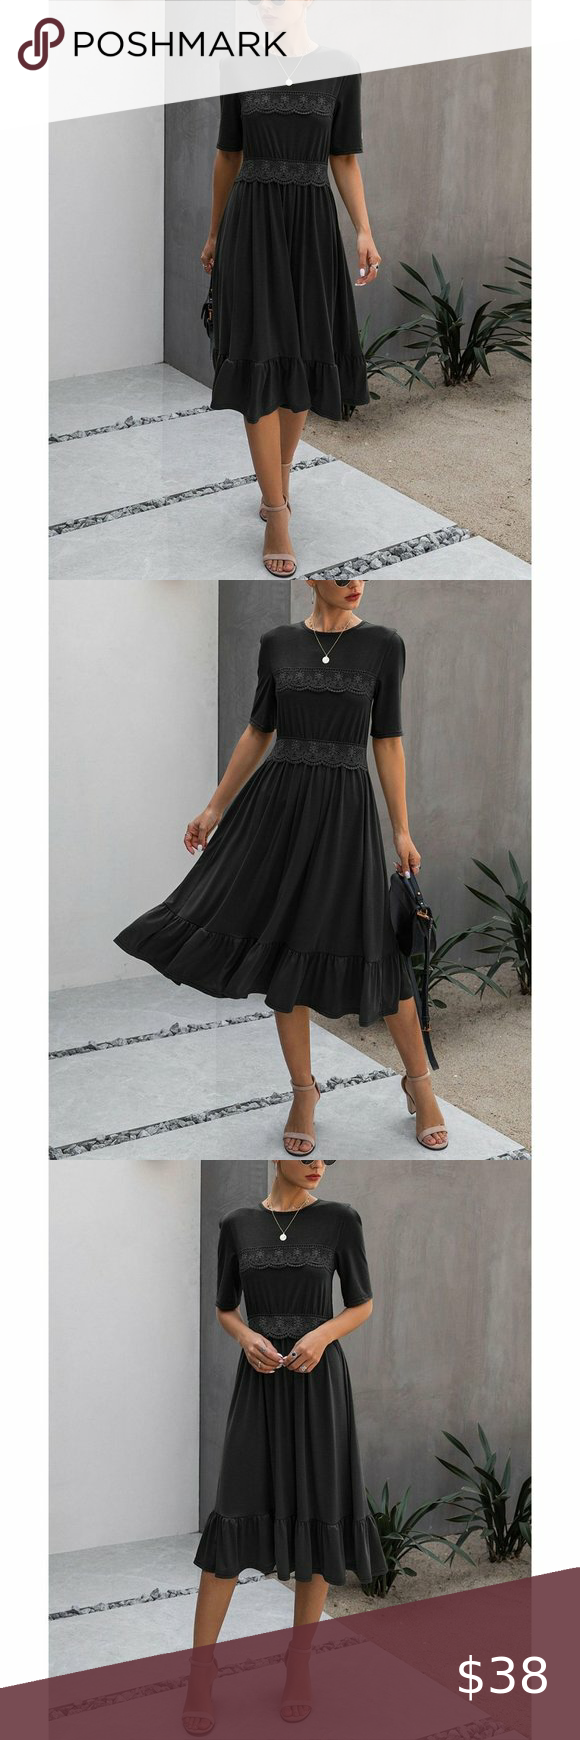 Nwt Black Lace Detail Ruffle Hem Midi Dress Xl Girls Fashion Dress Glam Girl Fashion Dress Size Chart Women [ 1740 x 580 Pixel ]